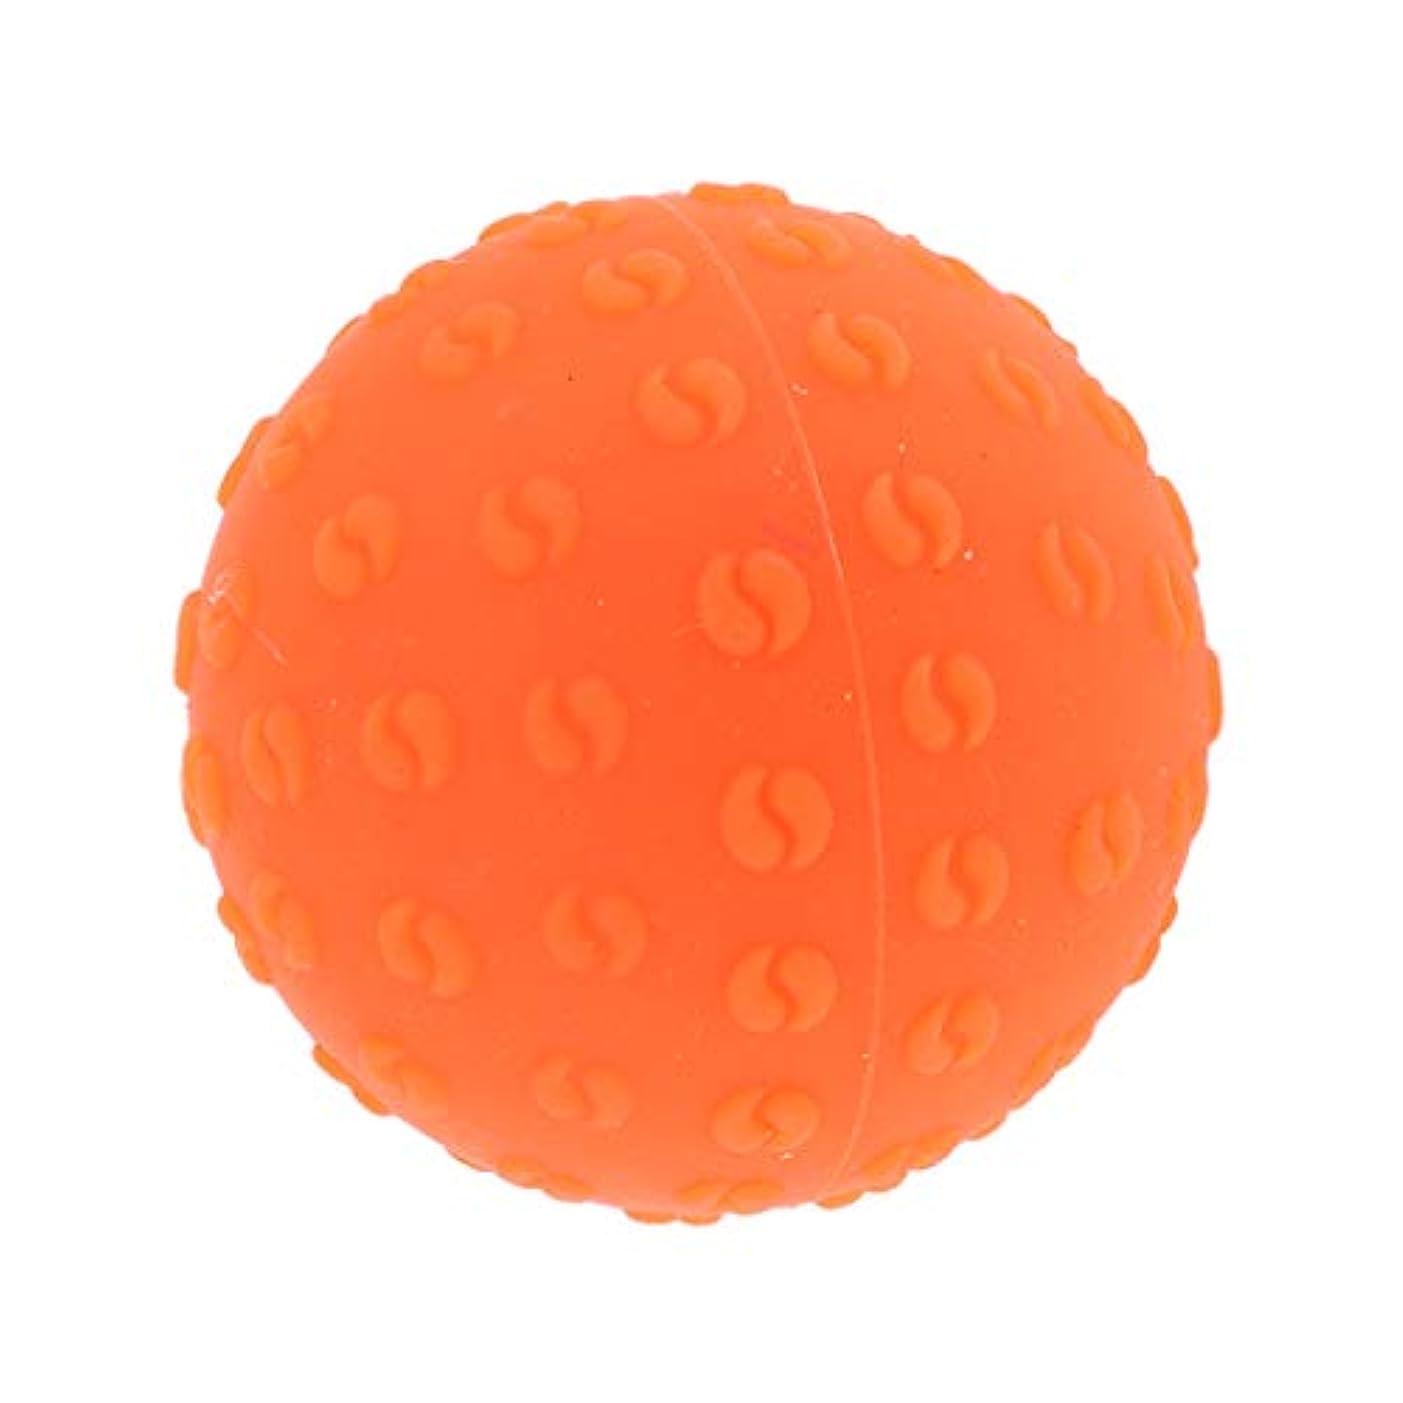 Fenteer マッサージボール 指圧ボール シリコーン トリガーポイント 足底筋膜炎 ヨガ ツボ押しグッズ 全6色 - オレンジ, 説明のとおり